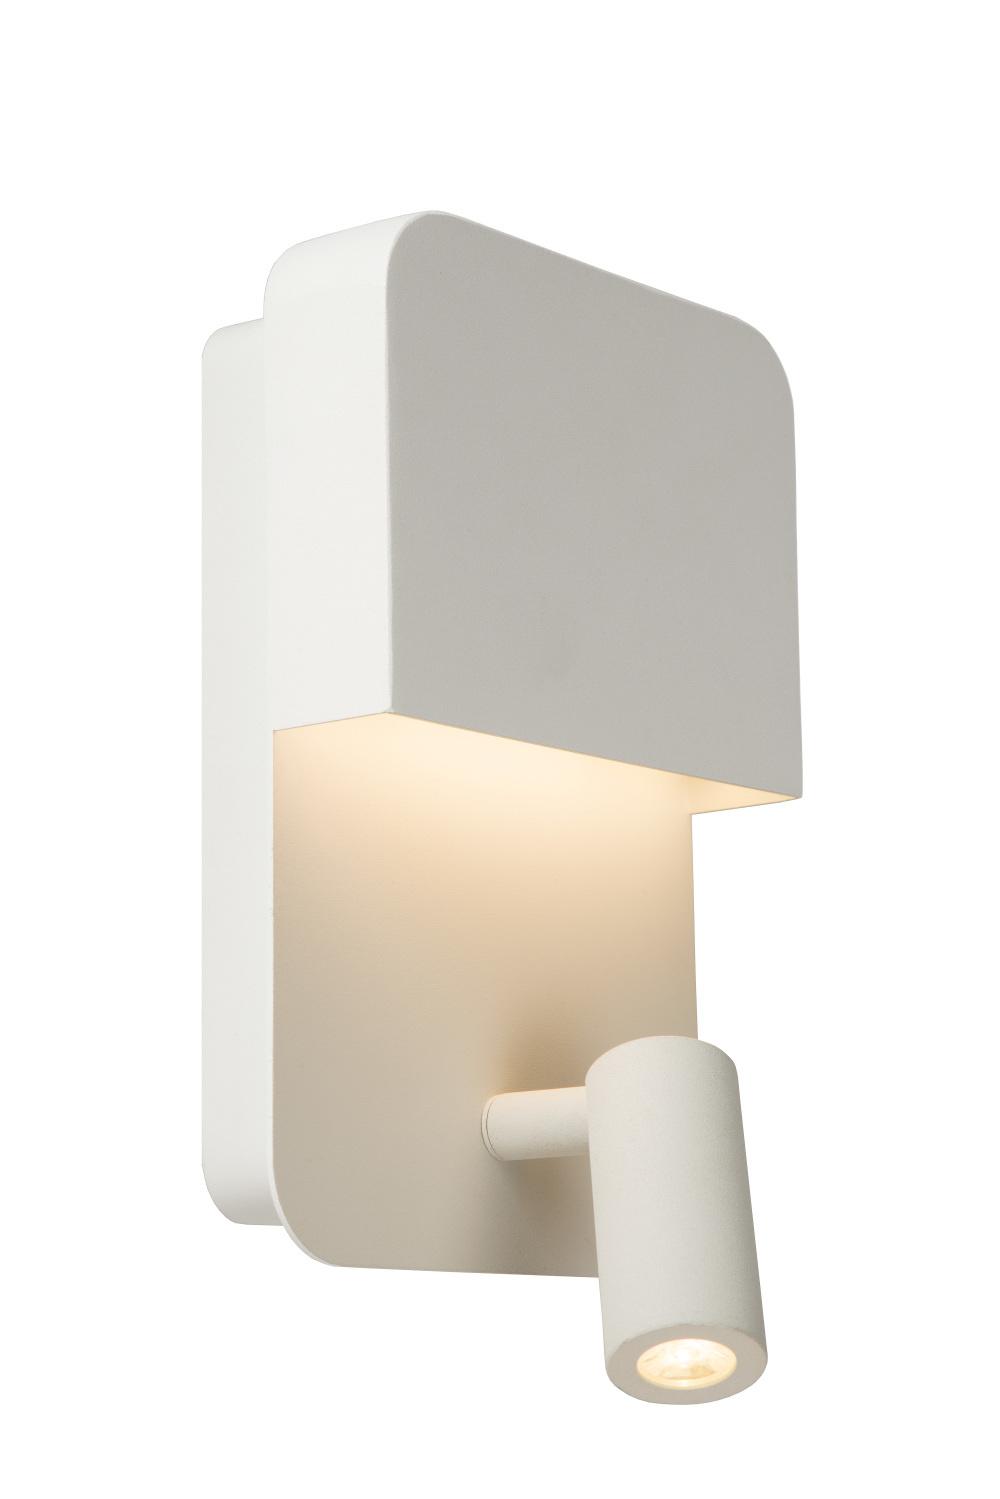 Lucide BOXER Wandlicht LED 5W+3W + USB Wit